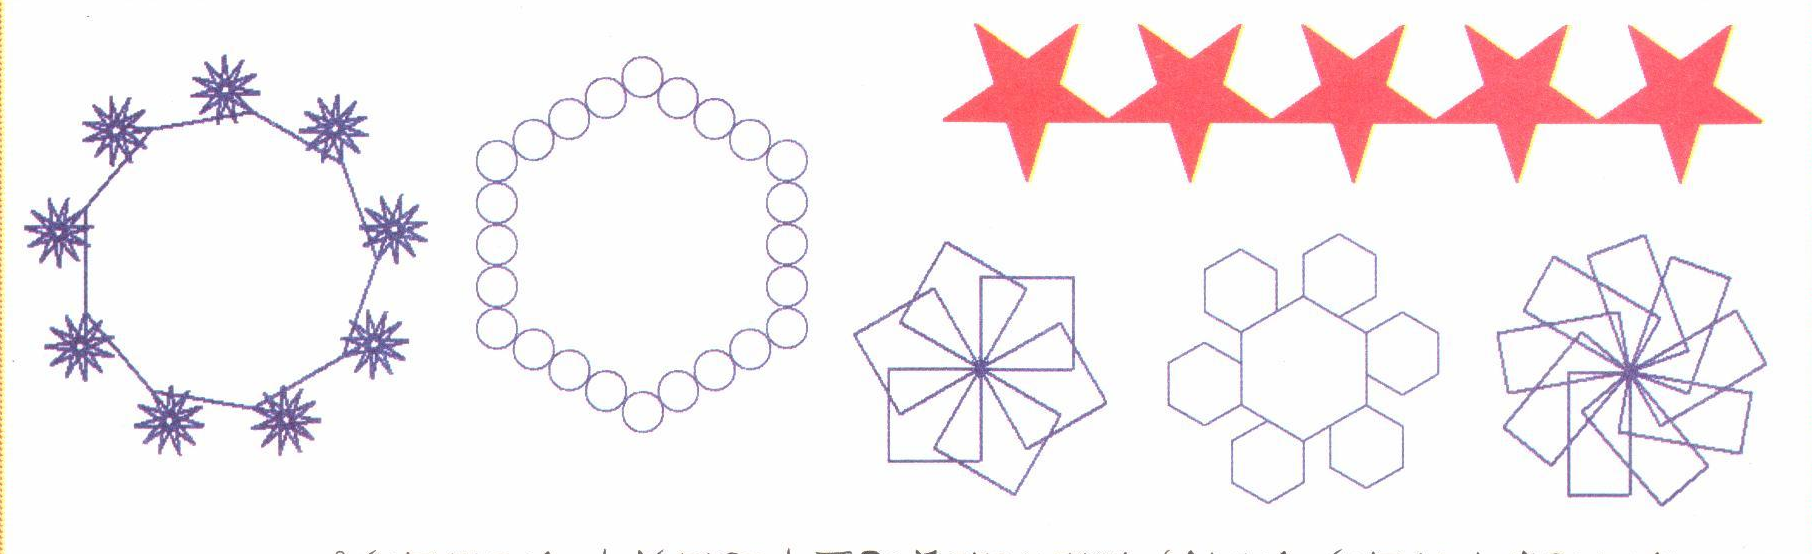 1 2012-03-06 logo小海龟画图怎么下载啊 70 2009-04-17 用logo语言图片